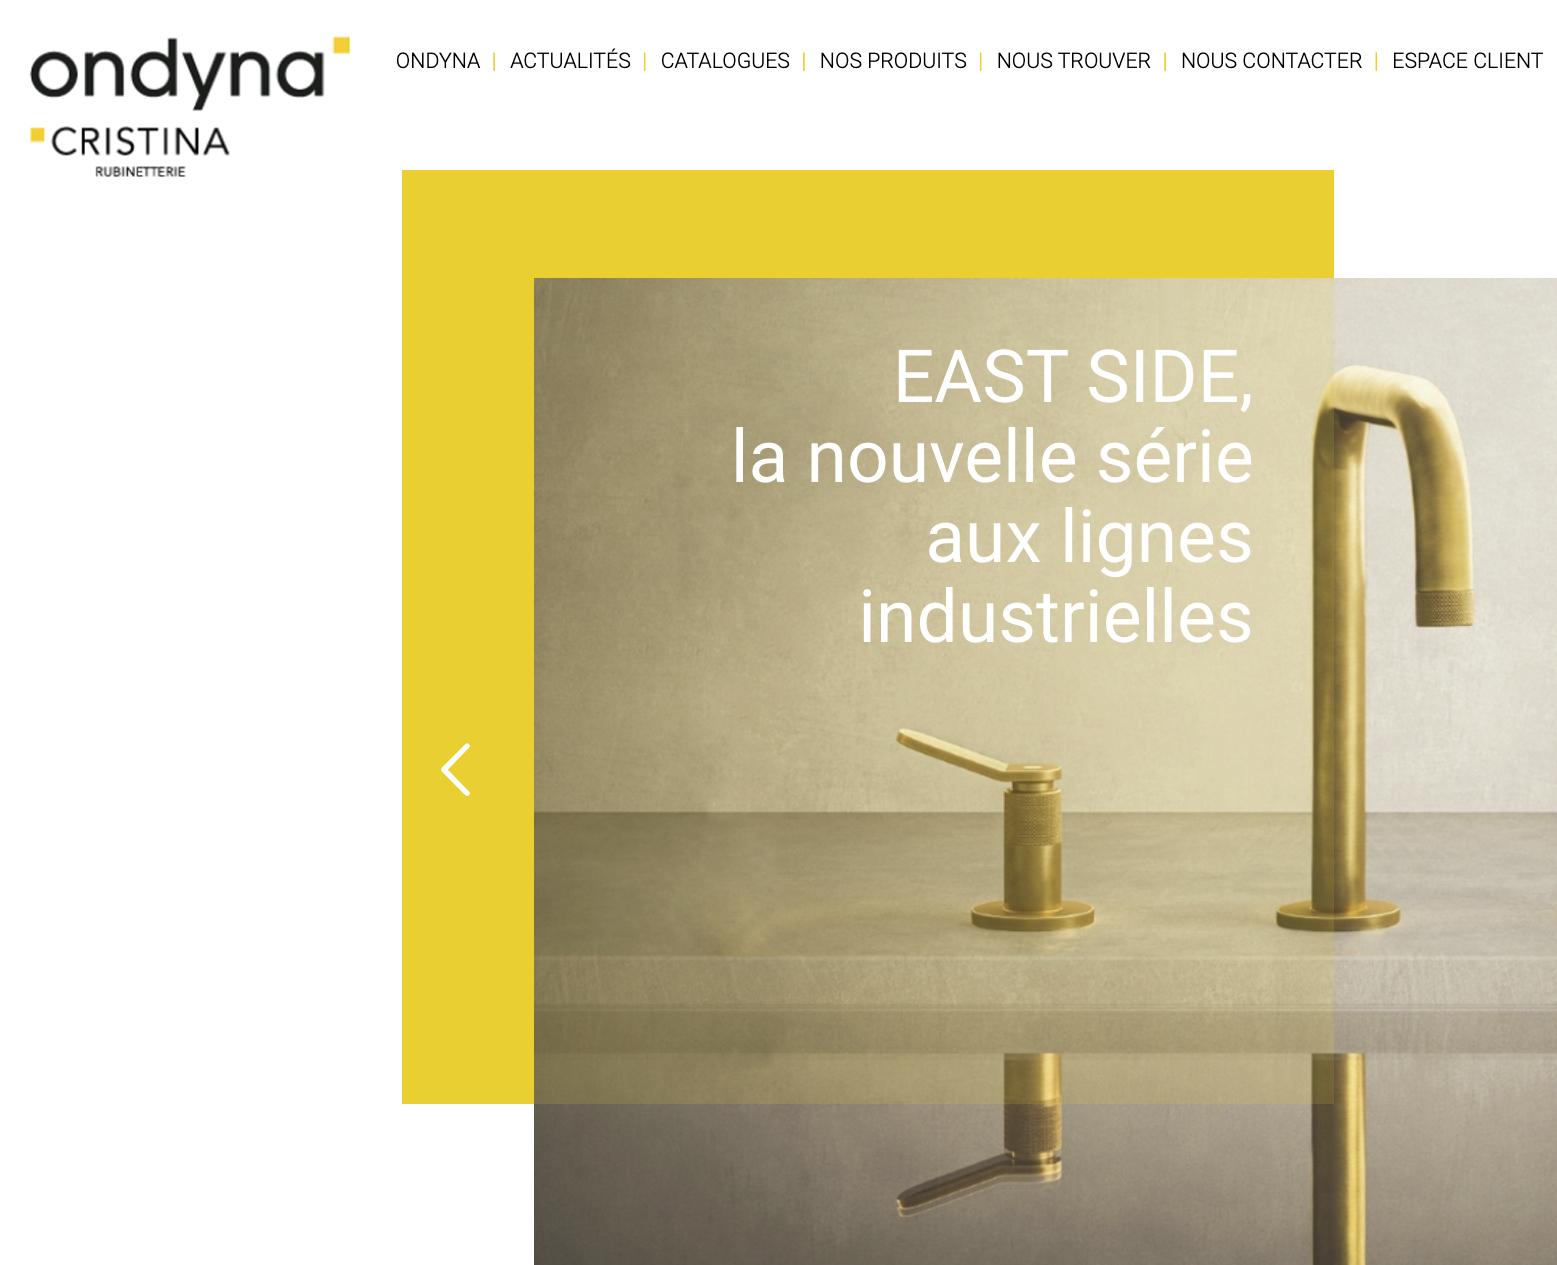 Site web, Ondyna, Cristina, internet